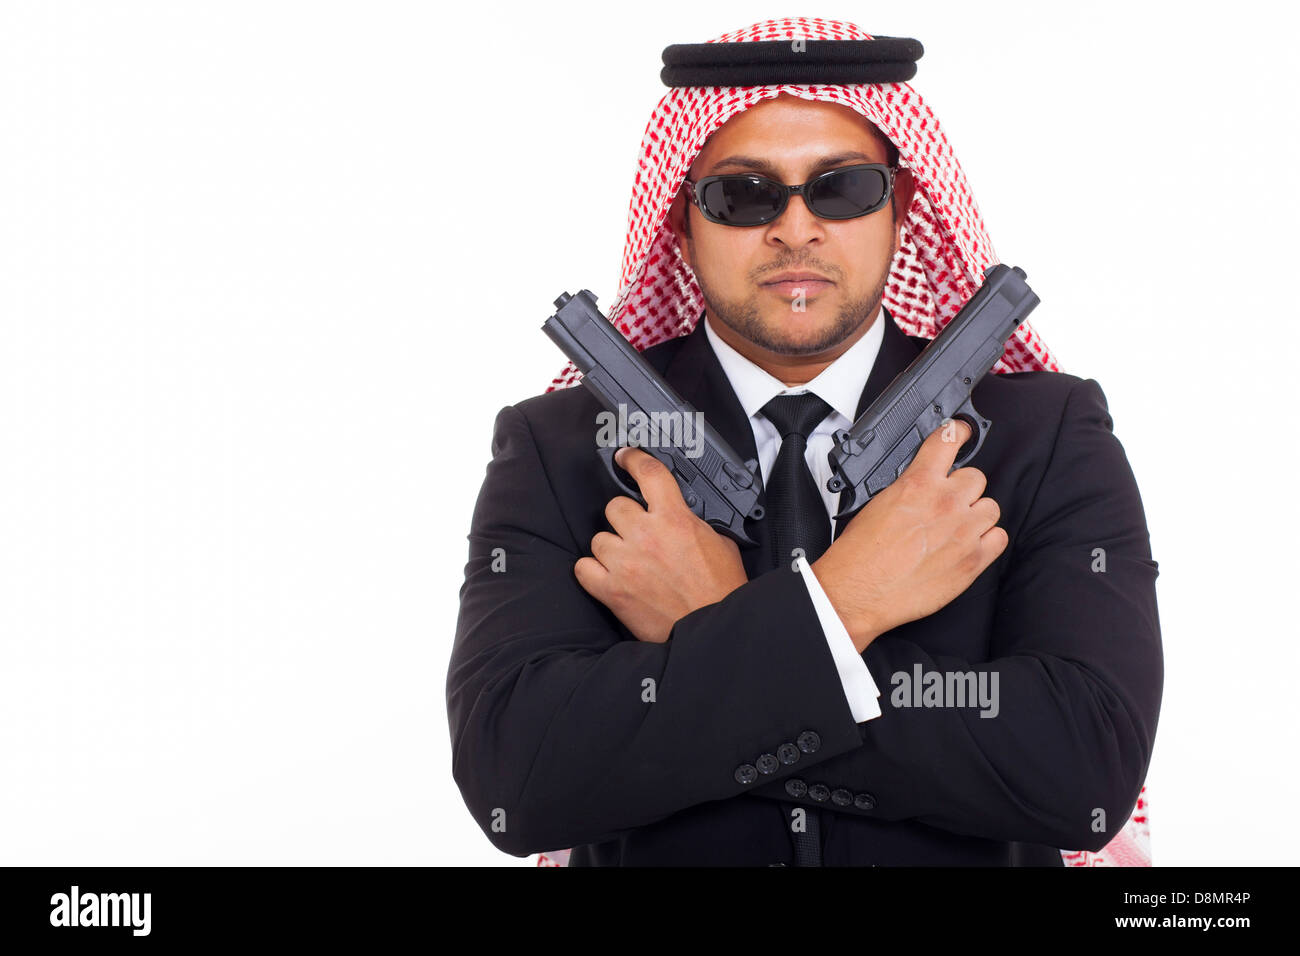 arabian mafia man holding pistols over white background - Stock Image